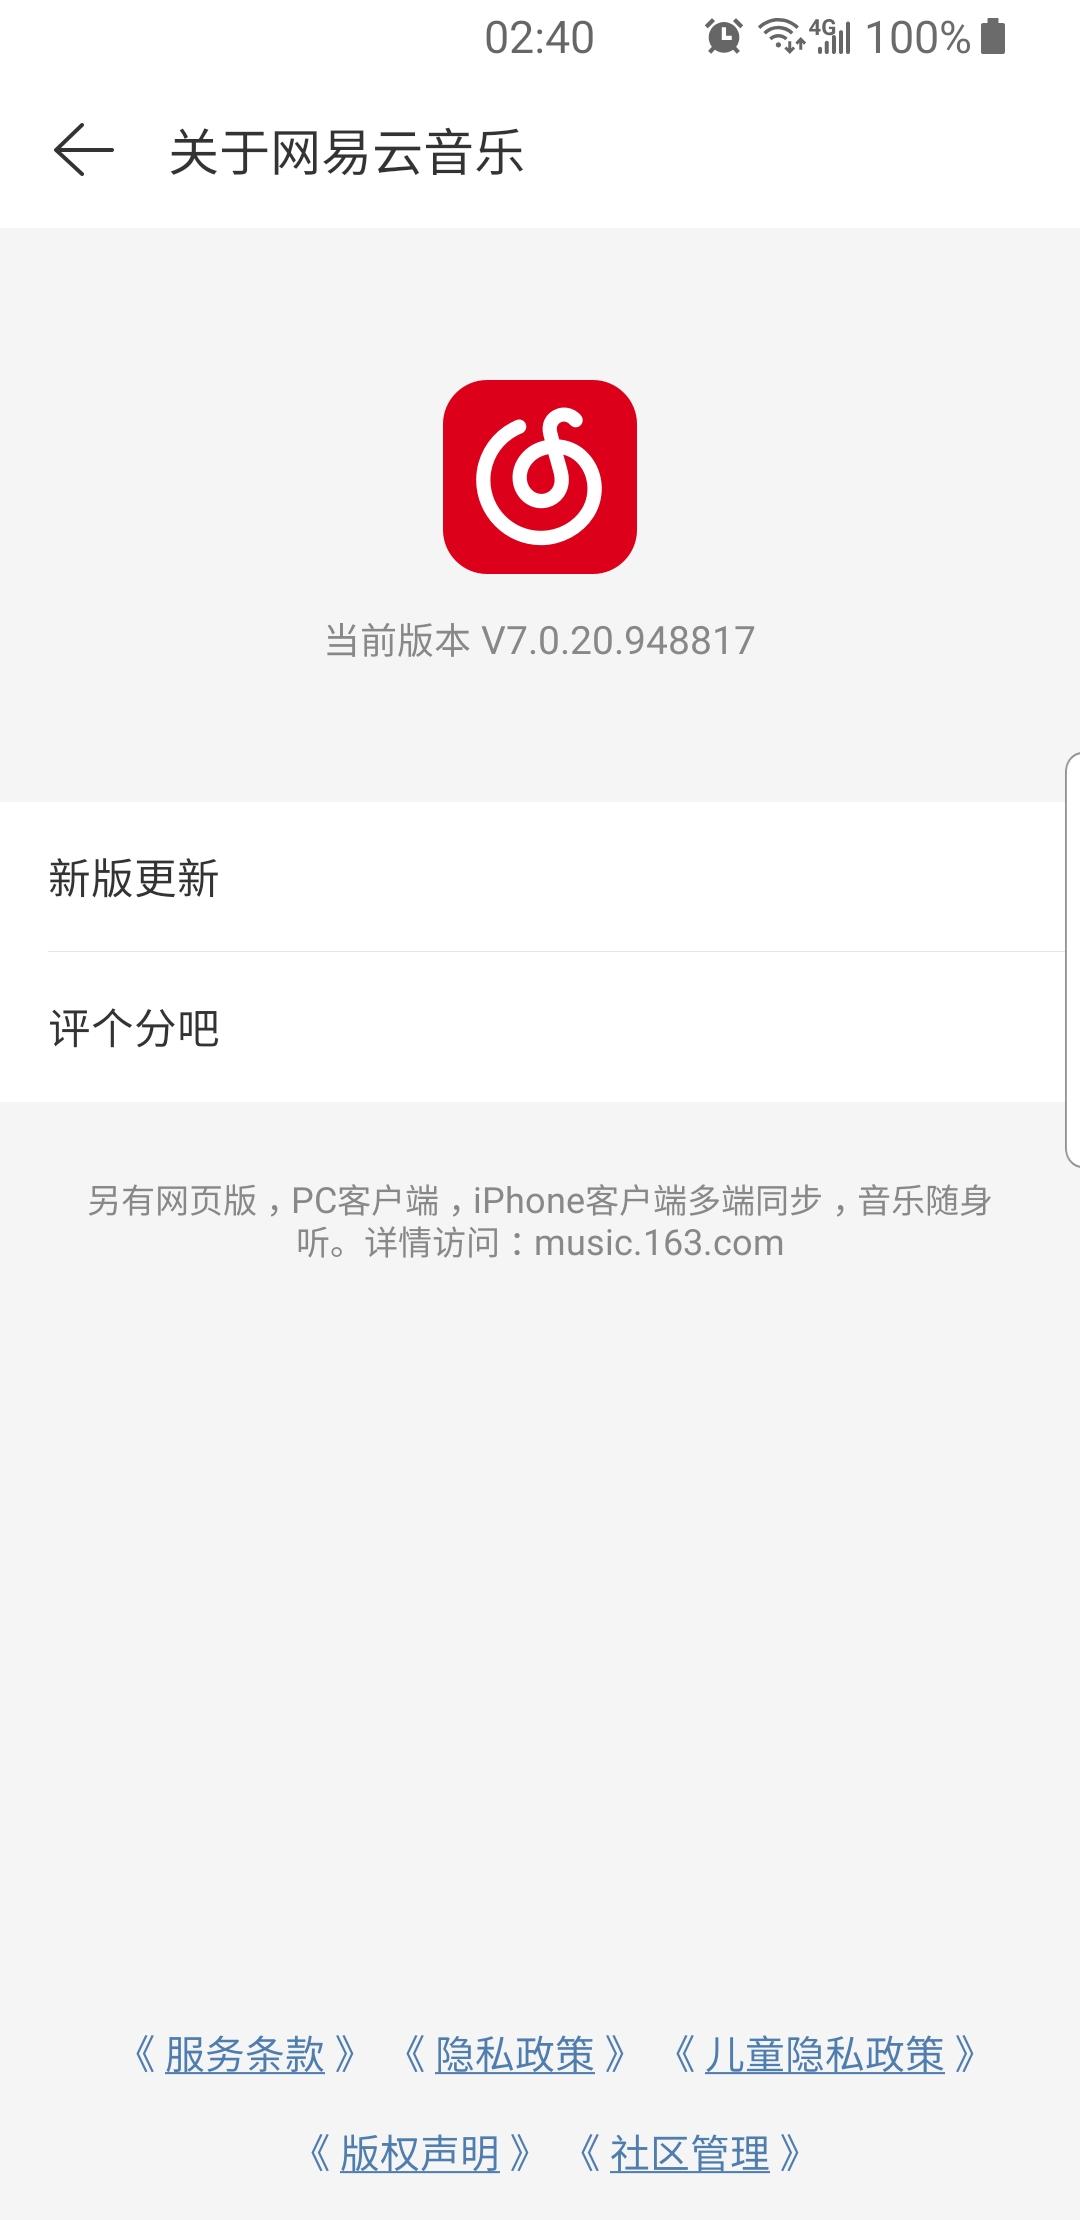 5e4ae3f195eea - Android | 网易云音乐 Google Play 下架前最后一版,无登录广告